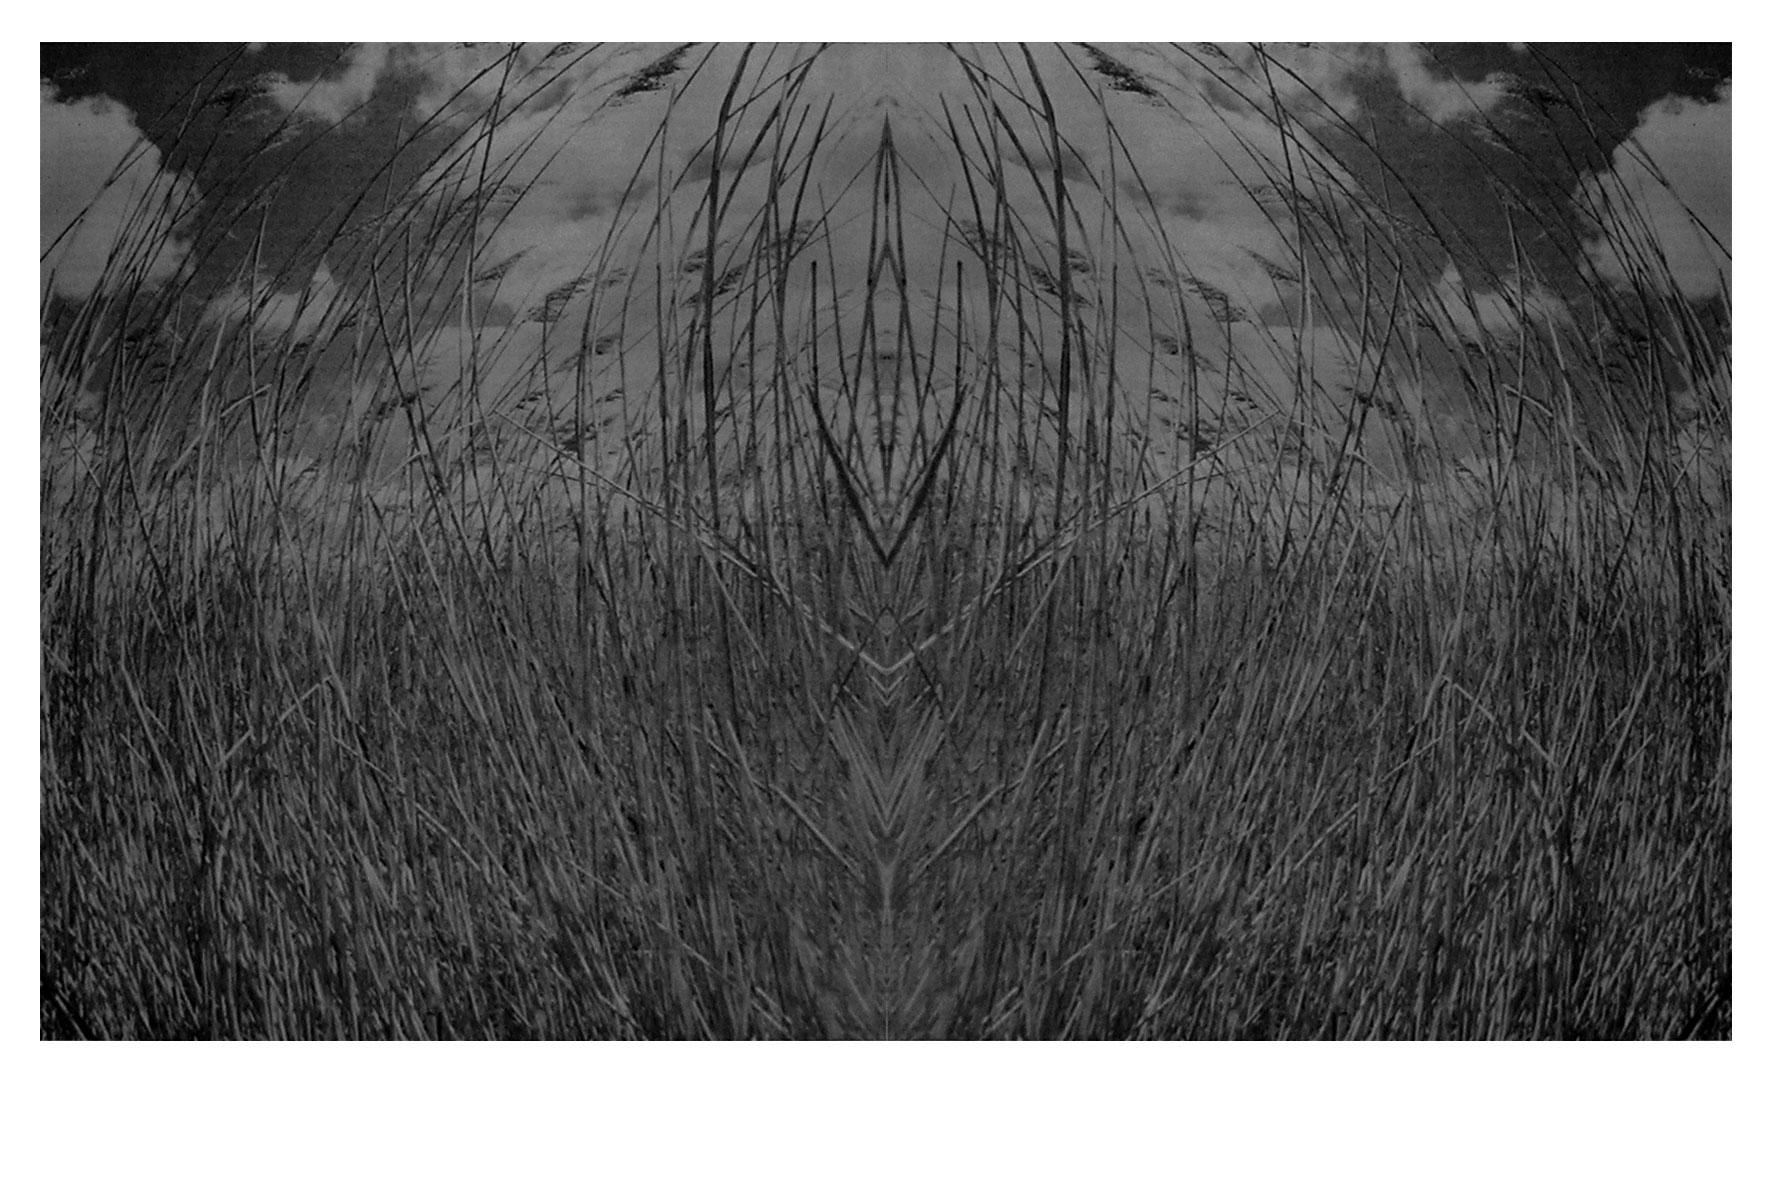 Trigo, paisaje, serigrafía, 48 x 80 cm, 1999.